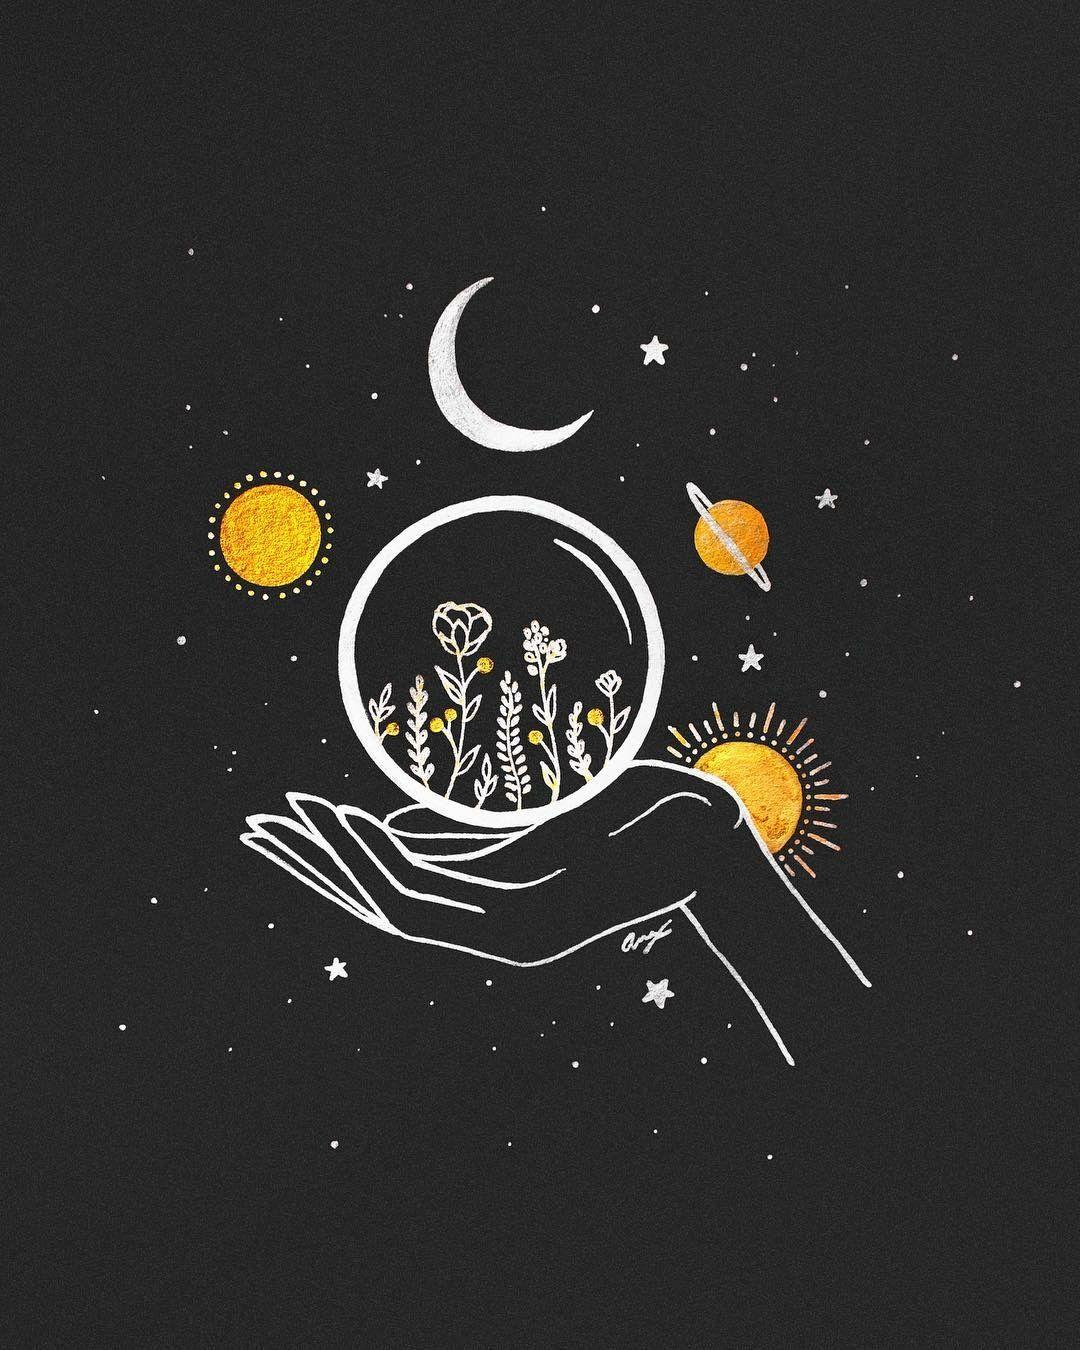 Pin By Ridwana Islam On My Kind Of Art Moon Art Art Inspiration Custom Wall Art